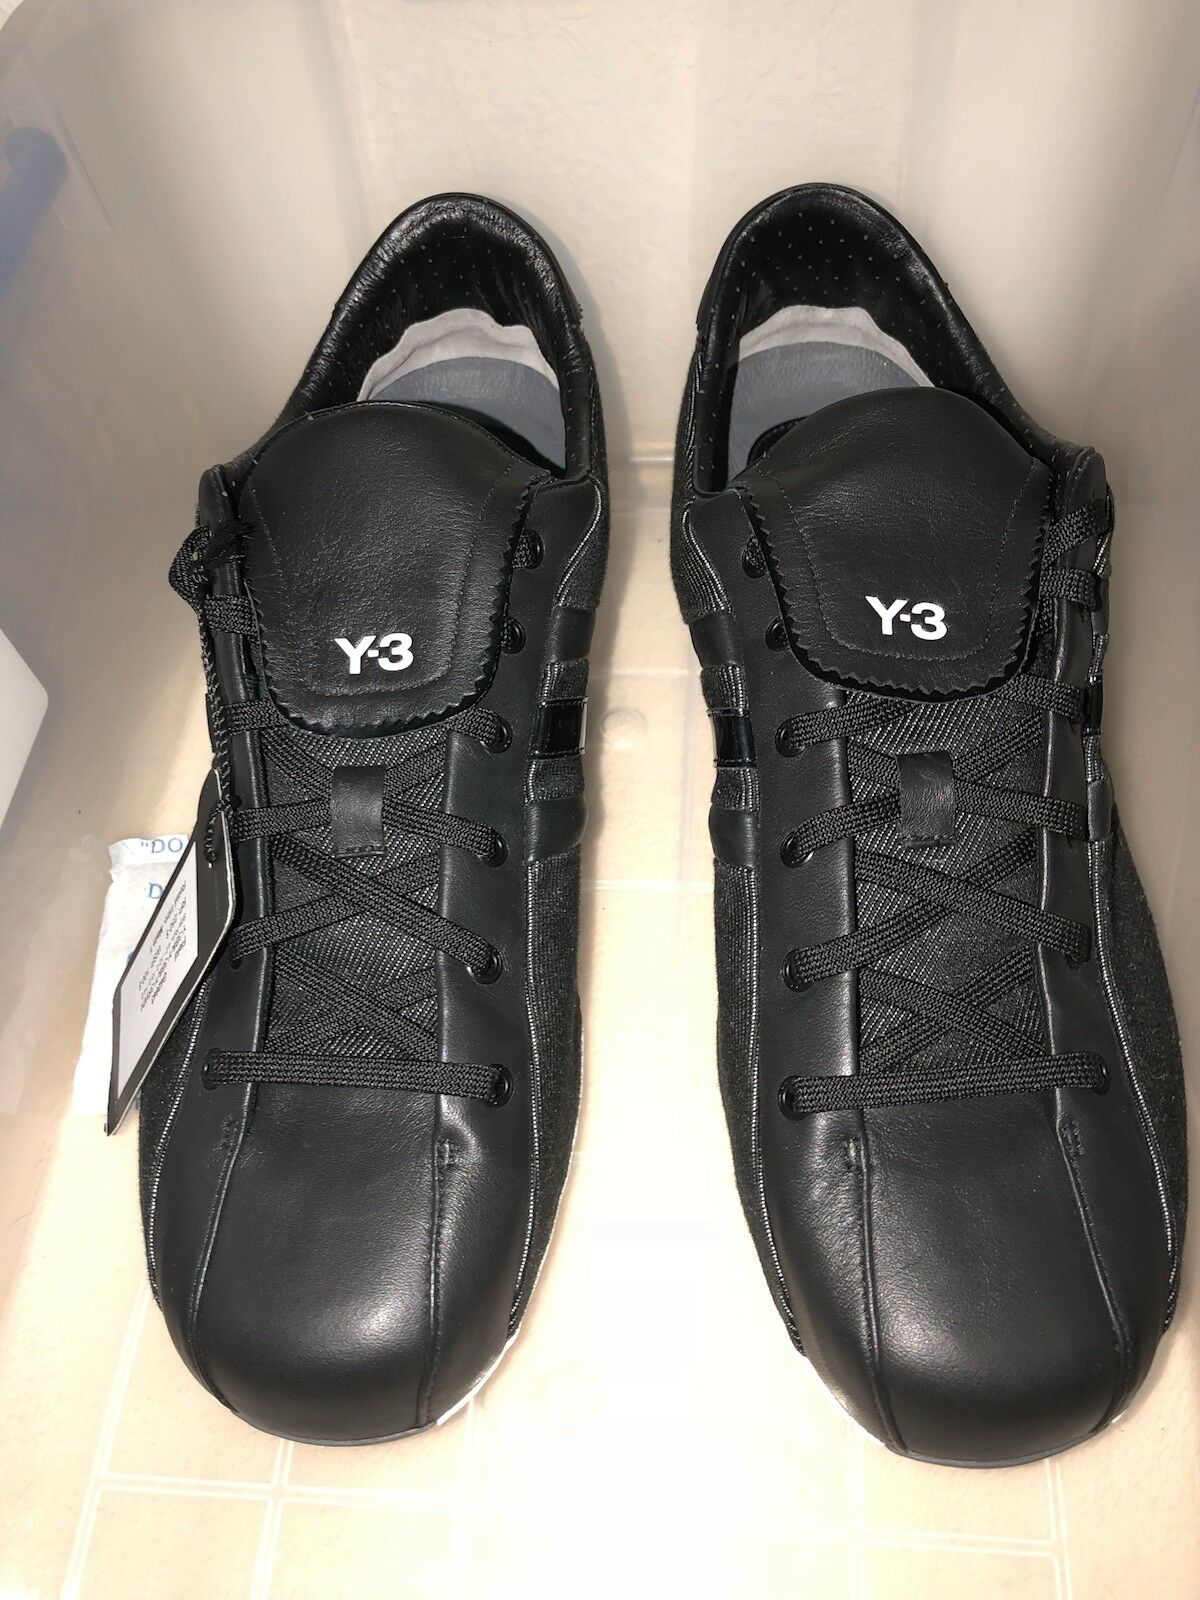 Y-3 Adidas Yohji Yamamoto Sz 9 Field Classics SAMPLE